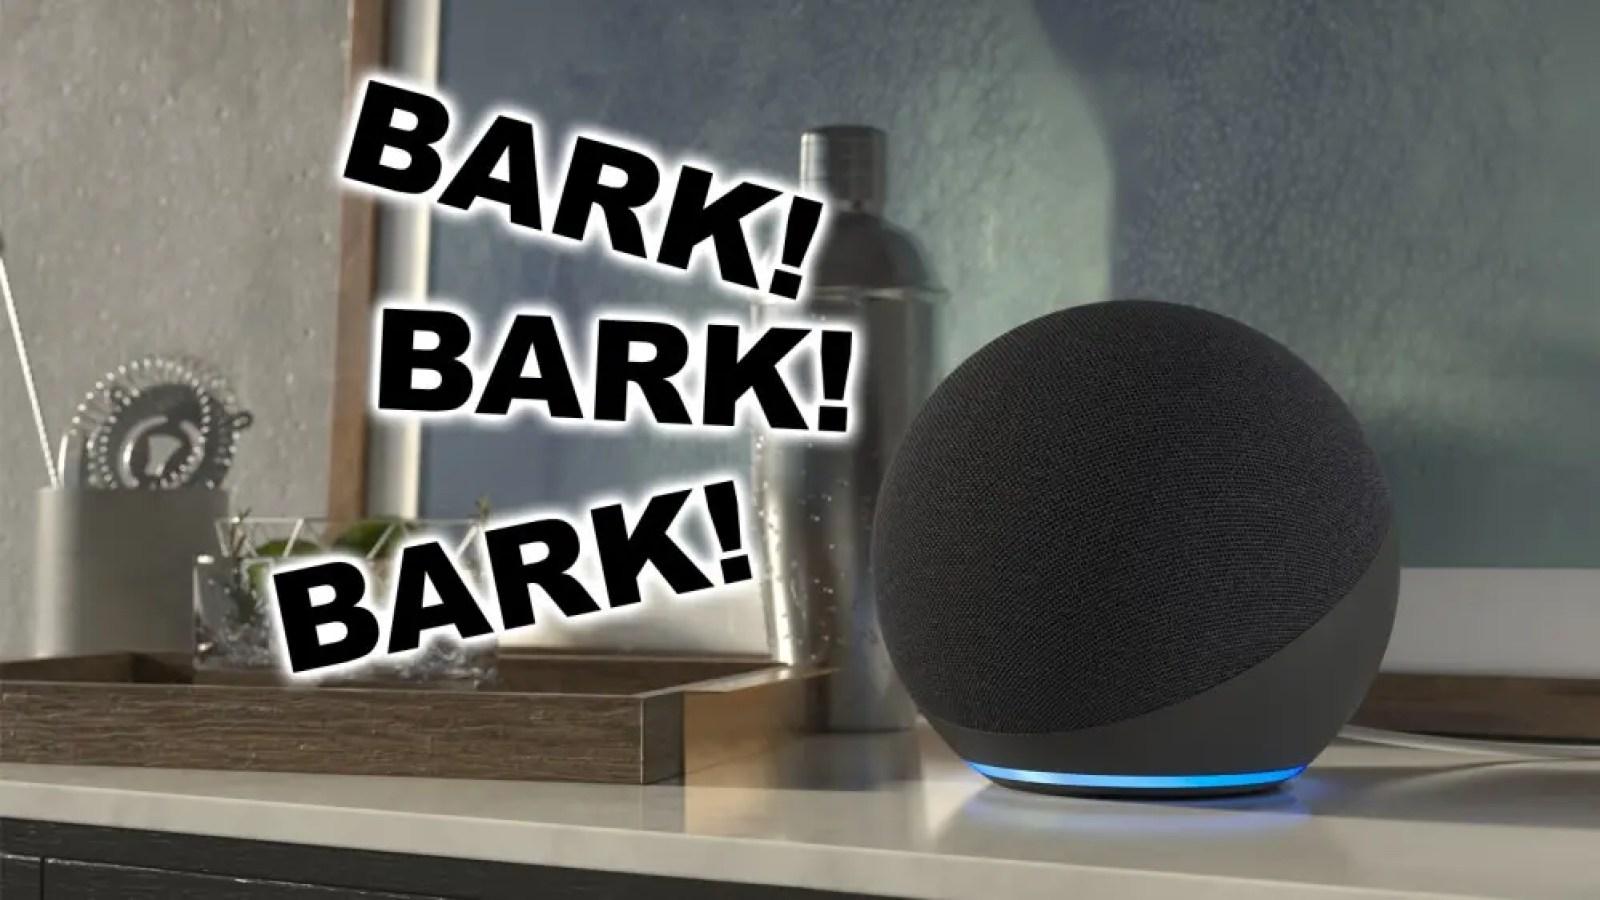 An illustration of the Echo smart speaker barking like a watchdog.